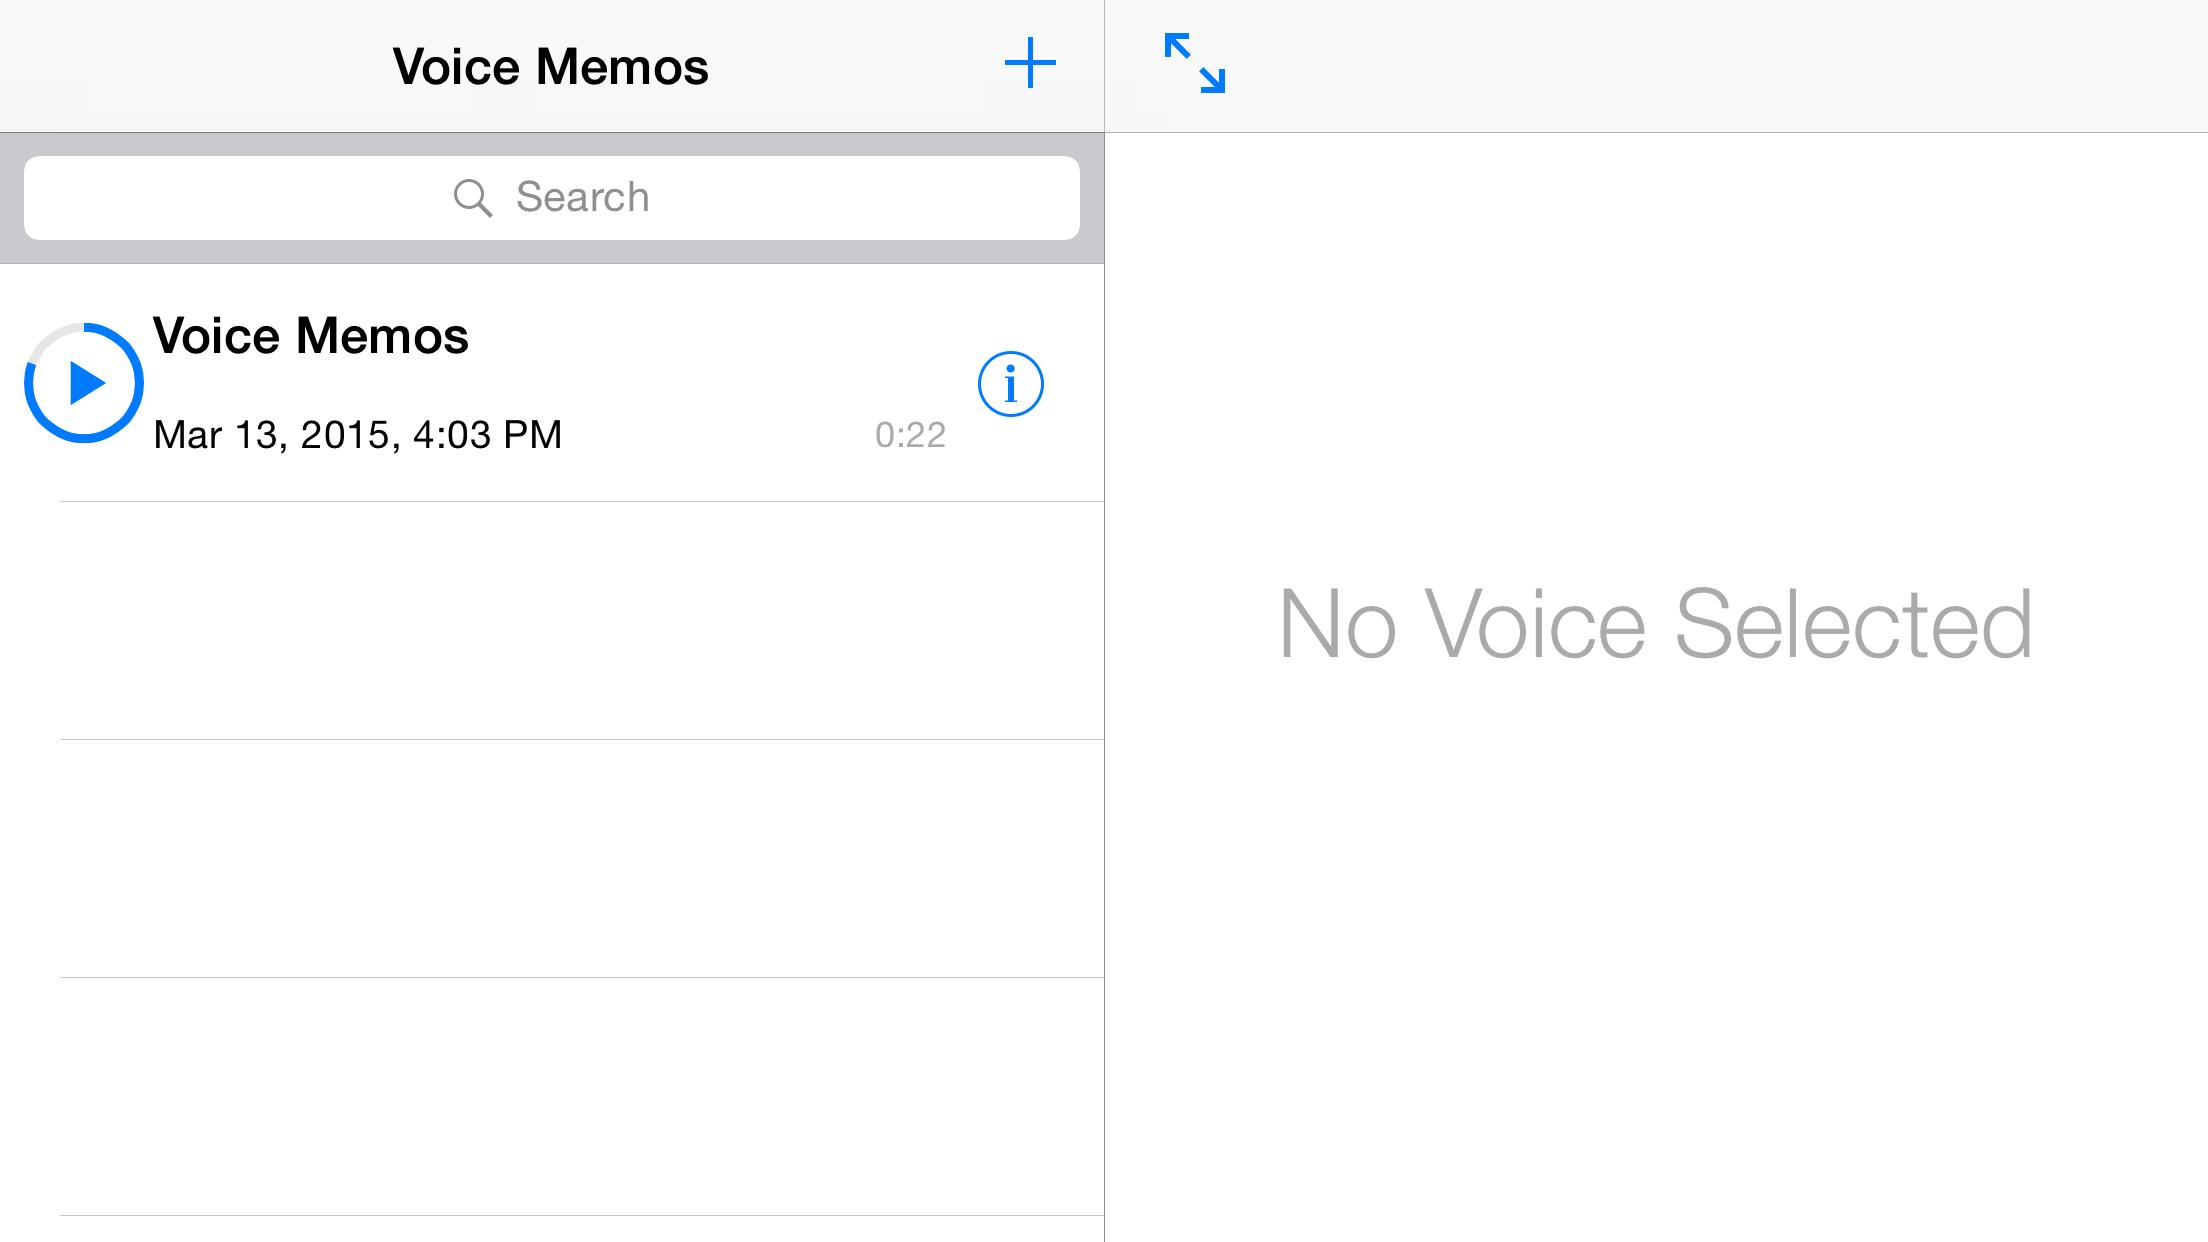 GitHub - MoZhouqi/VoiceMemos: Voice Memos is an audio